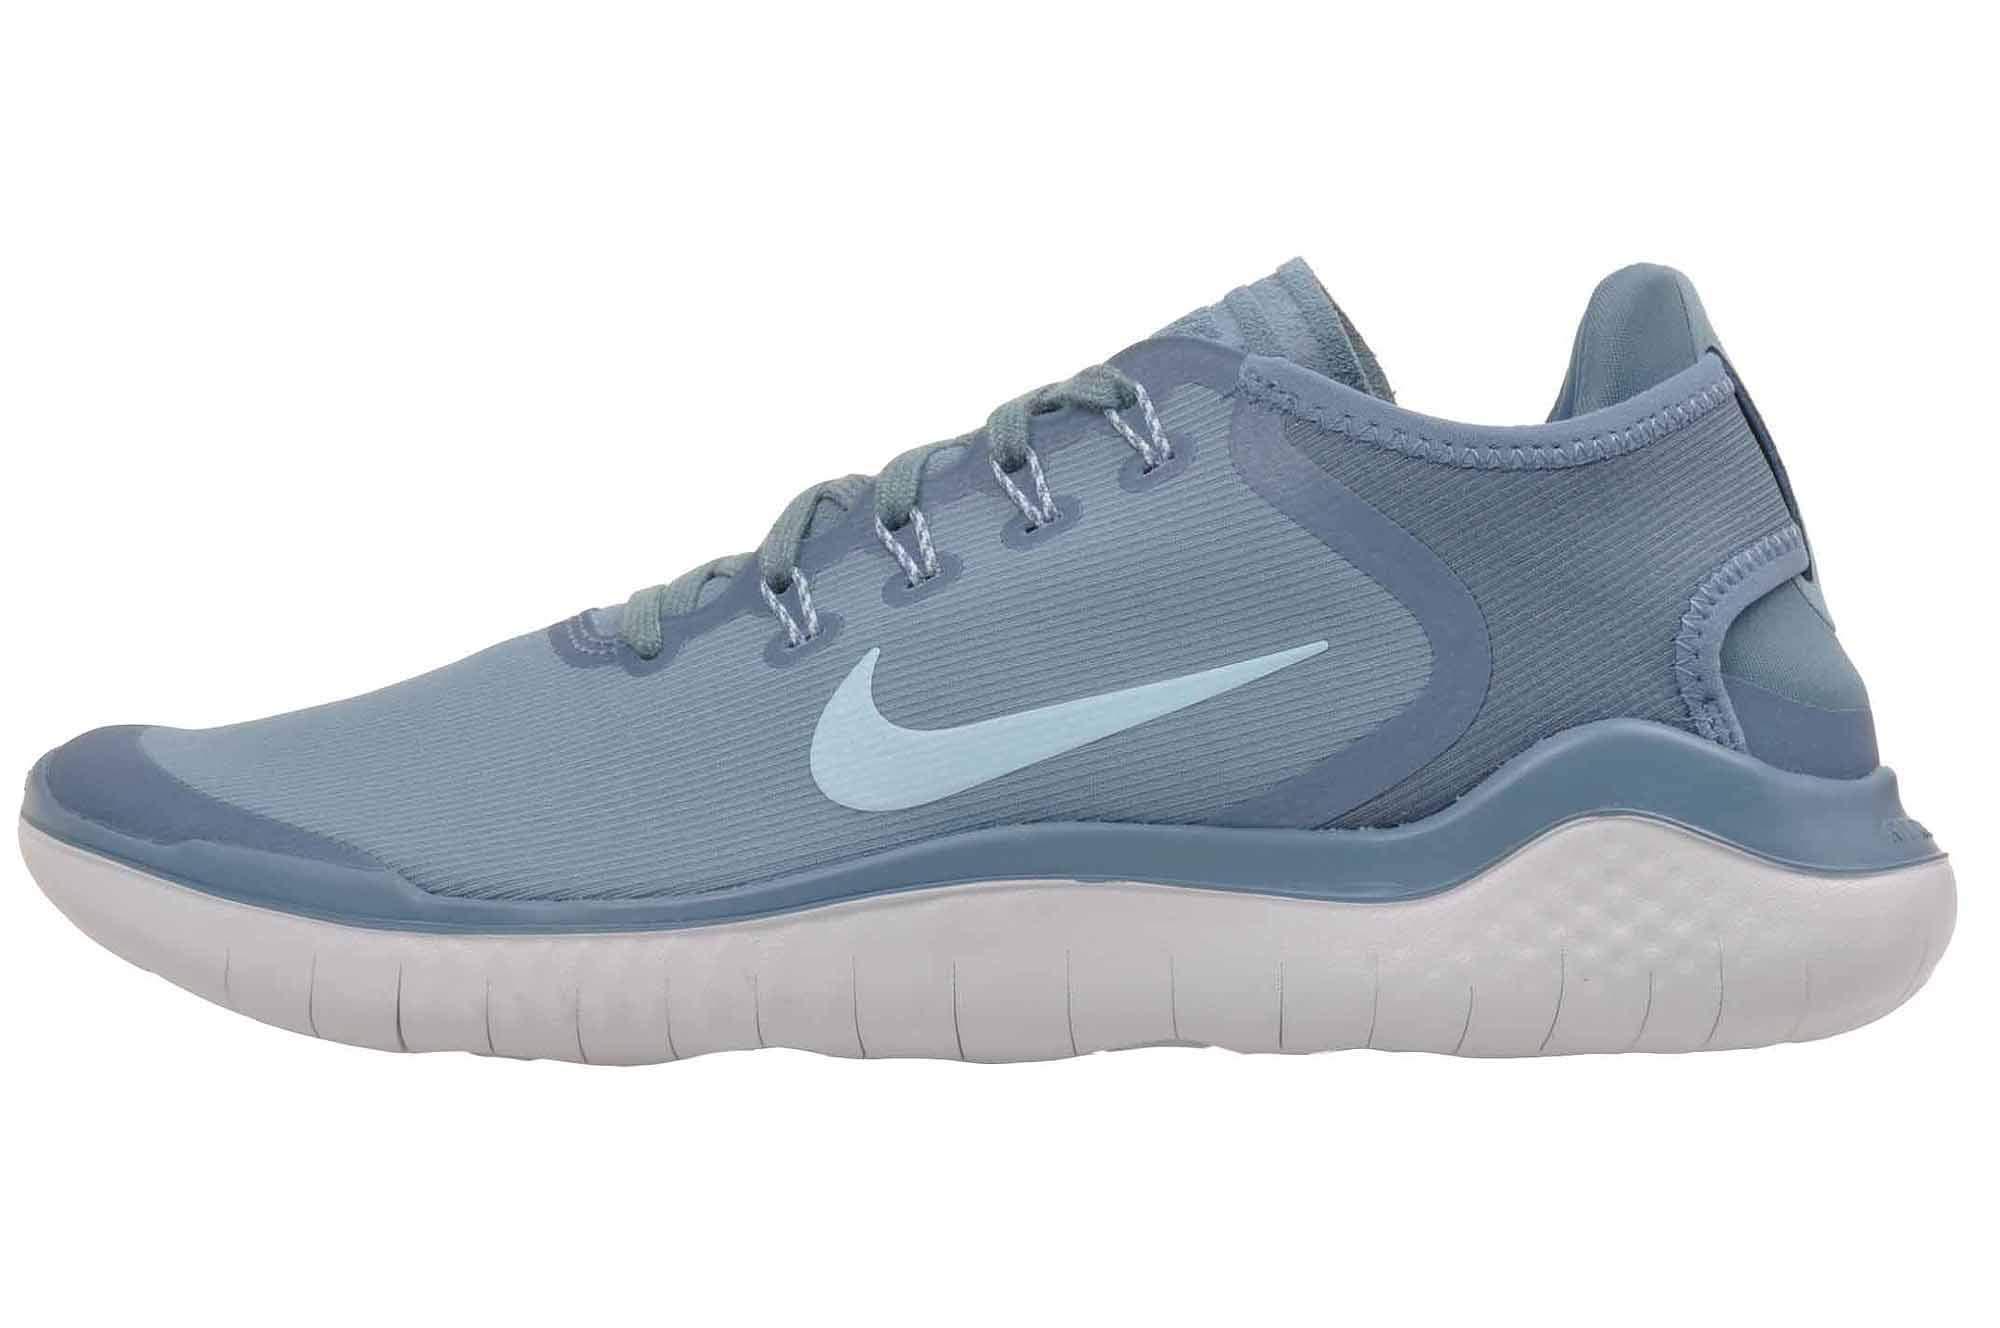 09e902e8c234c Galleon - Nike Free RN 2018 Sun Running Shoe (10 D(M) US